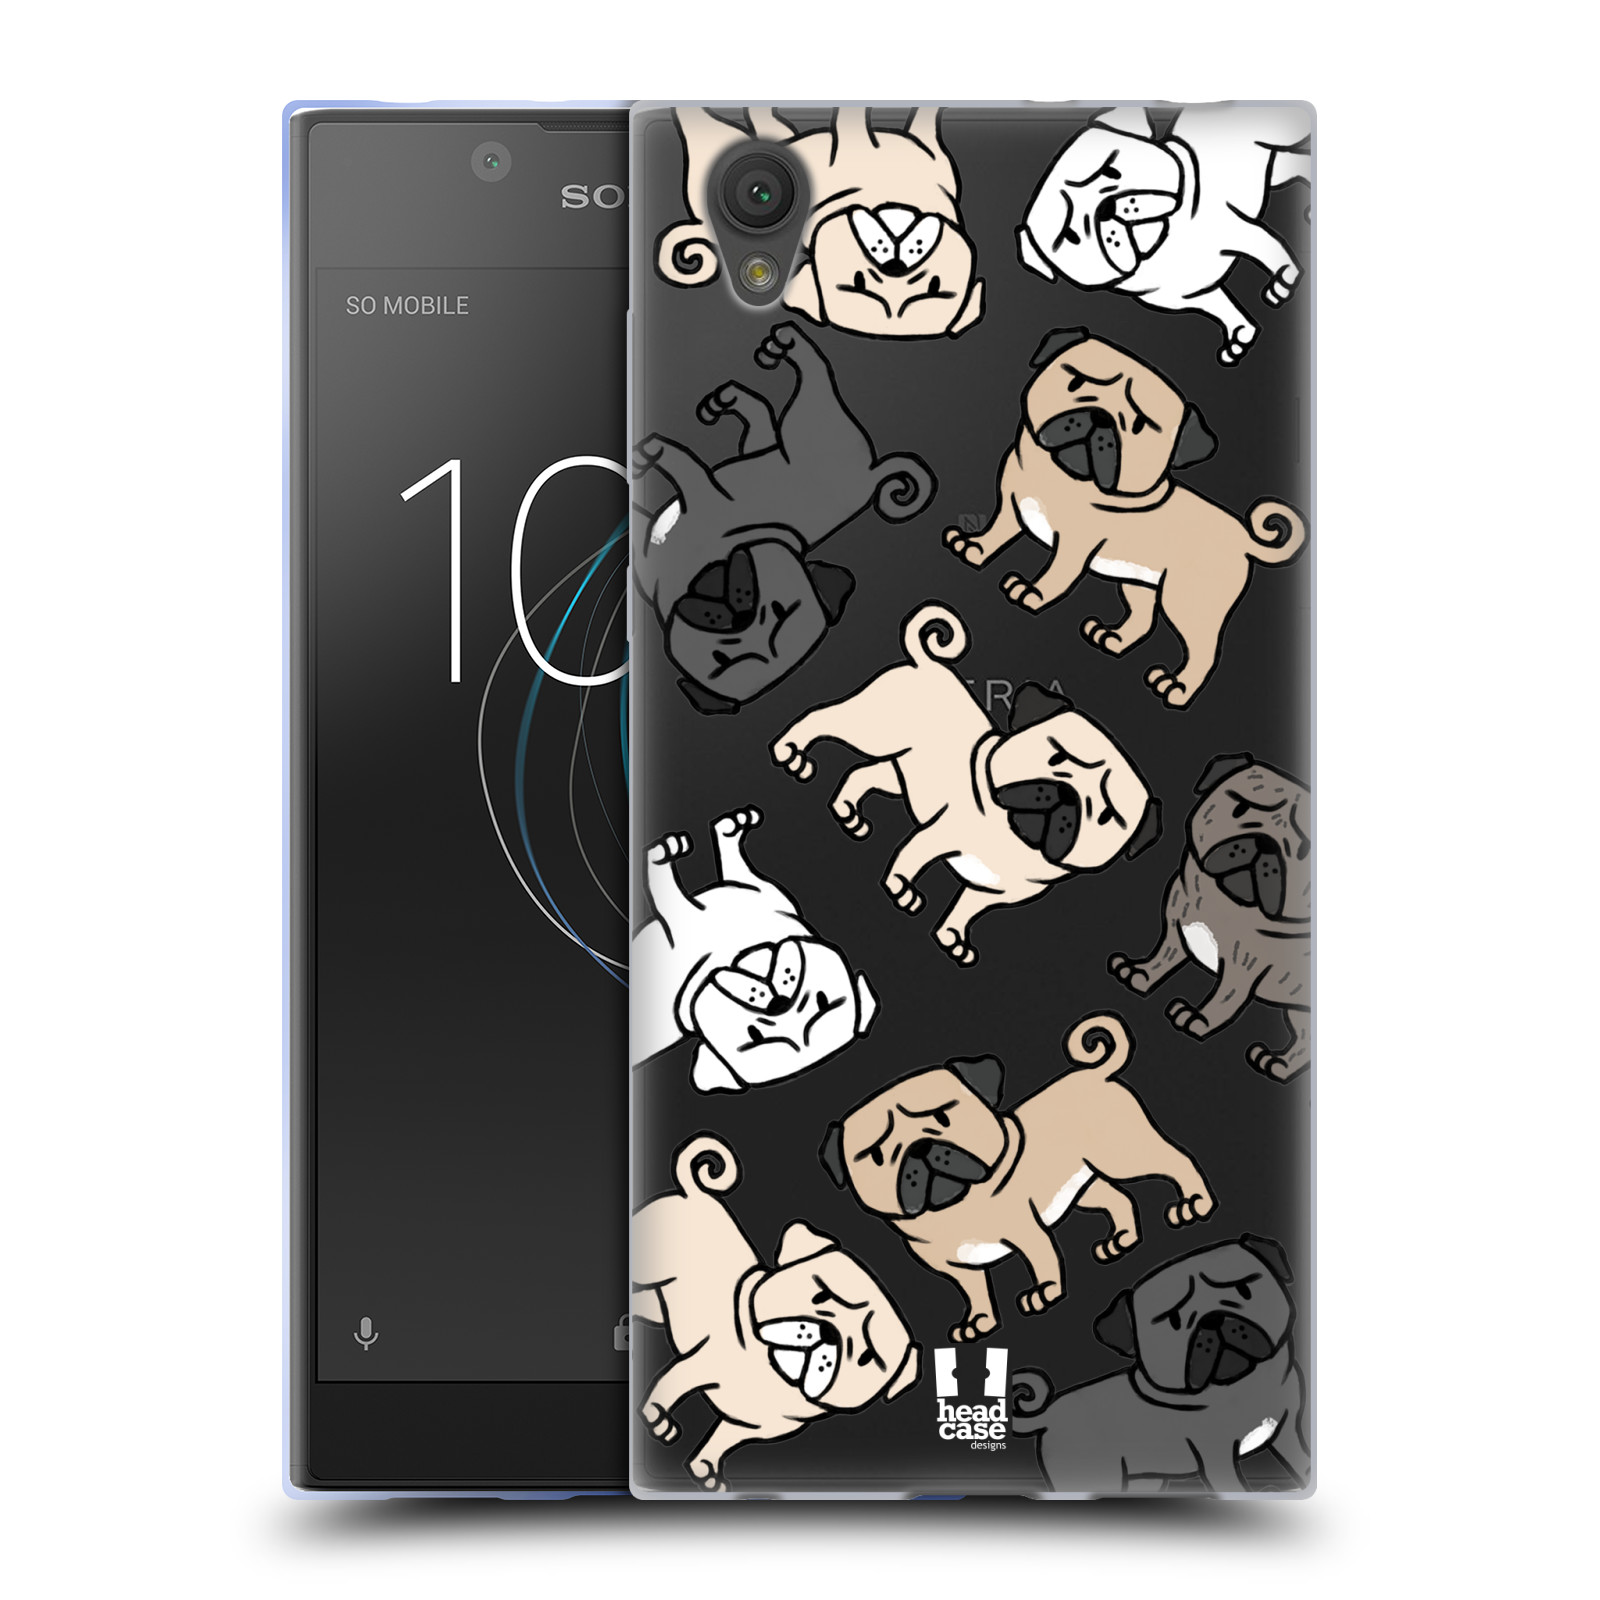 HEAD CASE silikonový obal na mobil Sony Xperia L1 pejsek Pug Mopsík